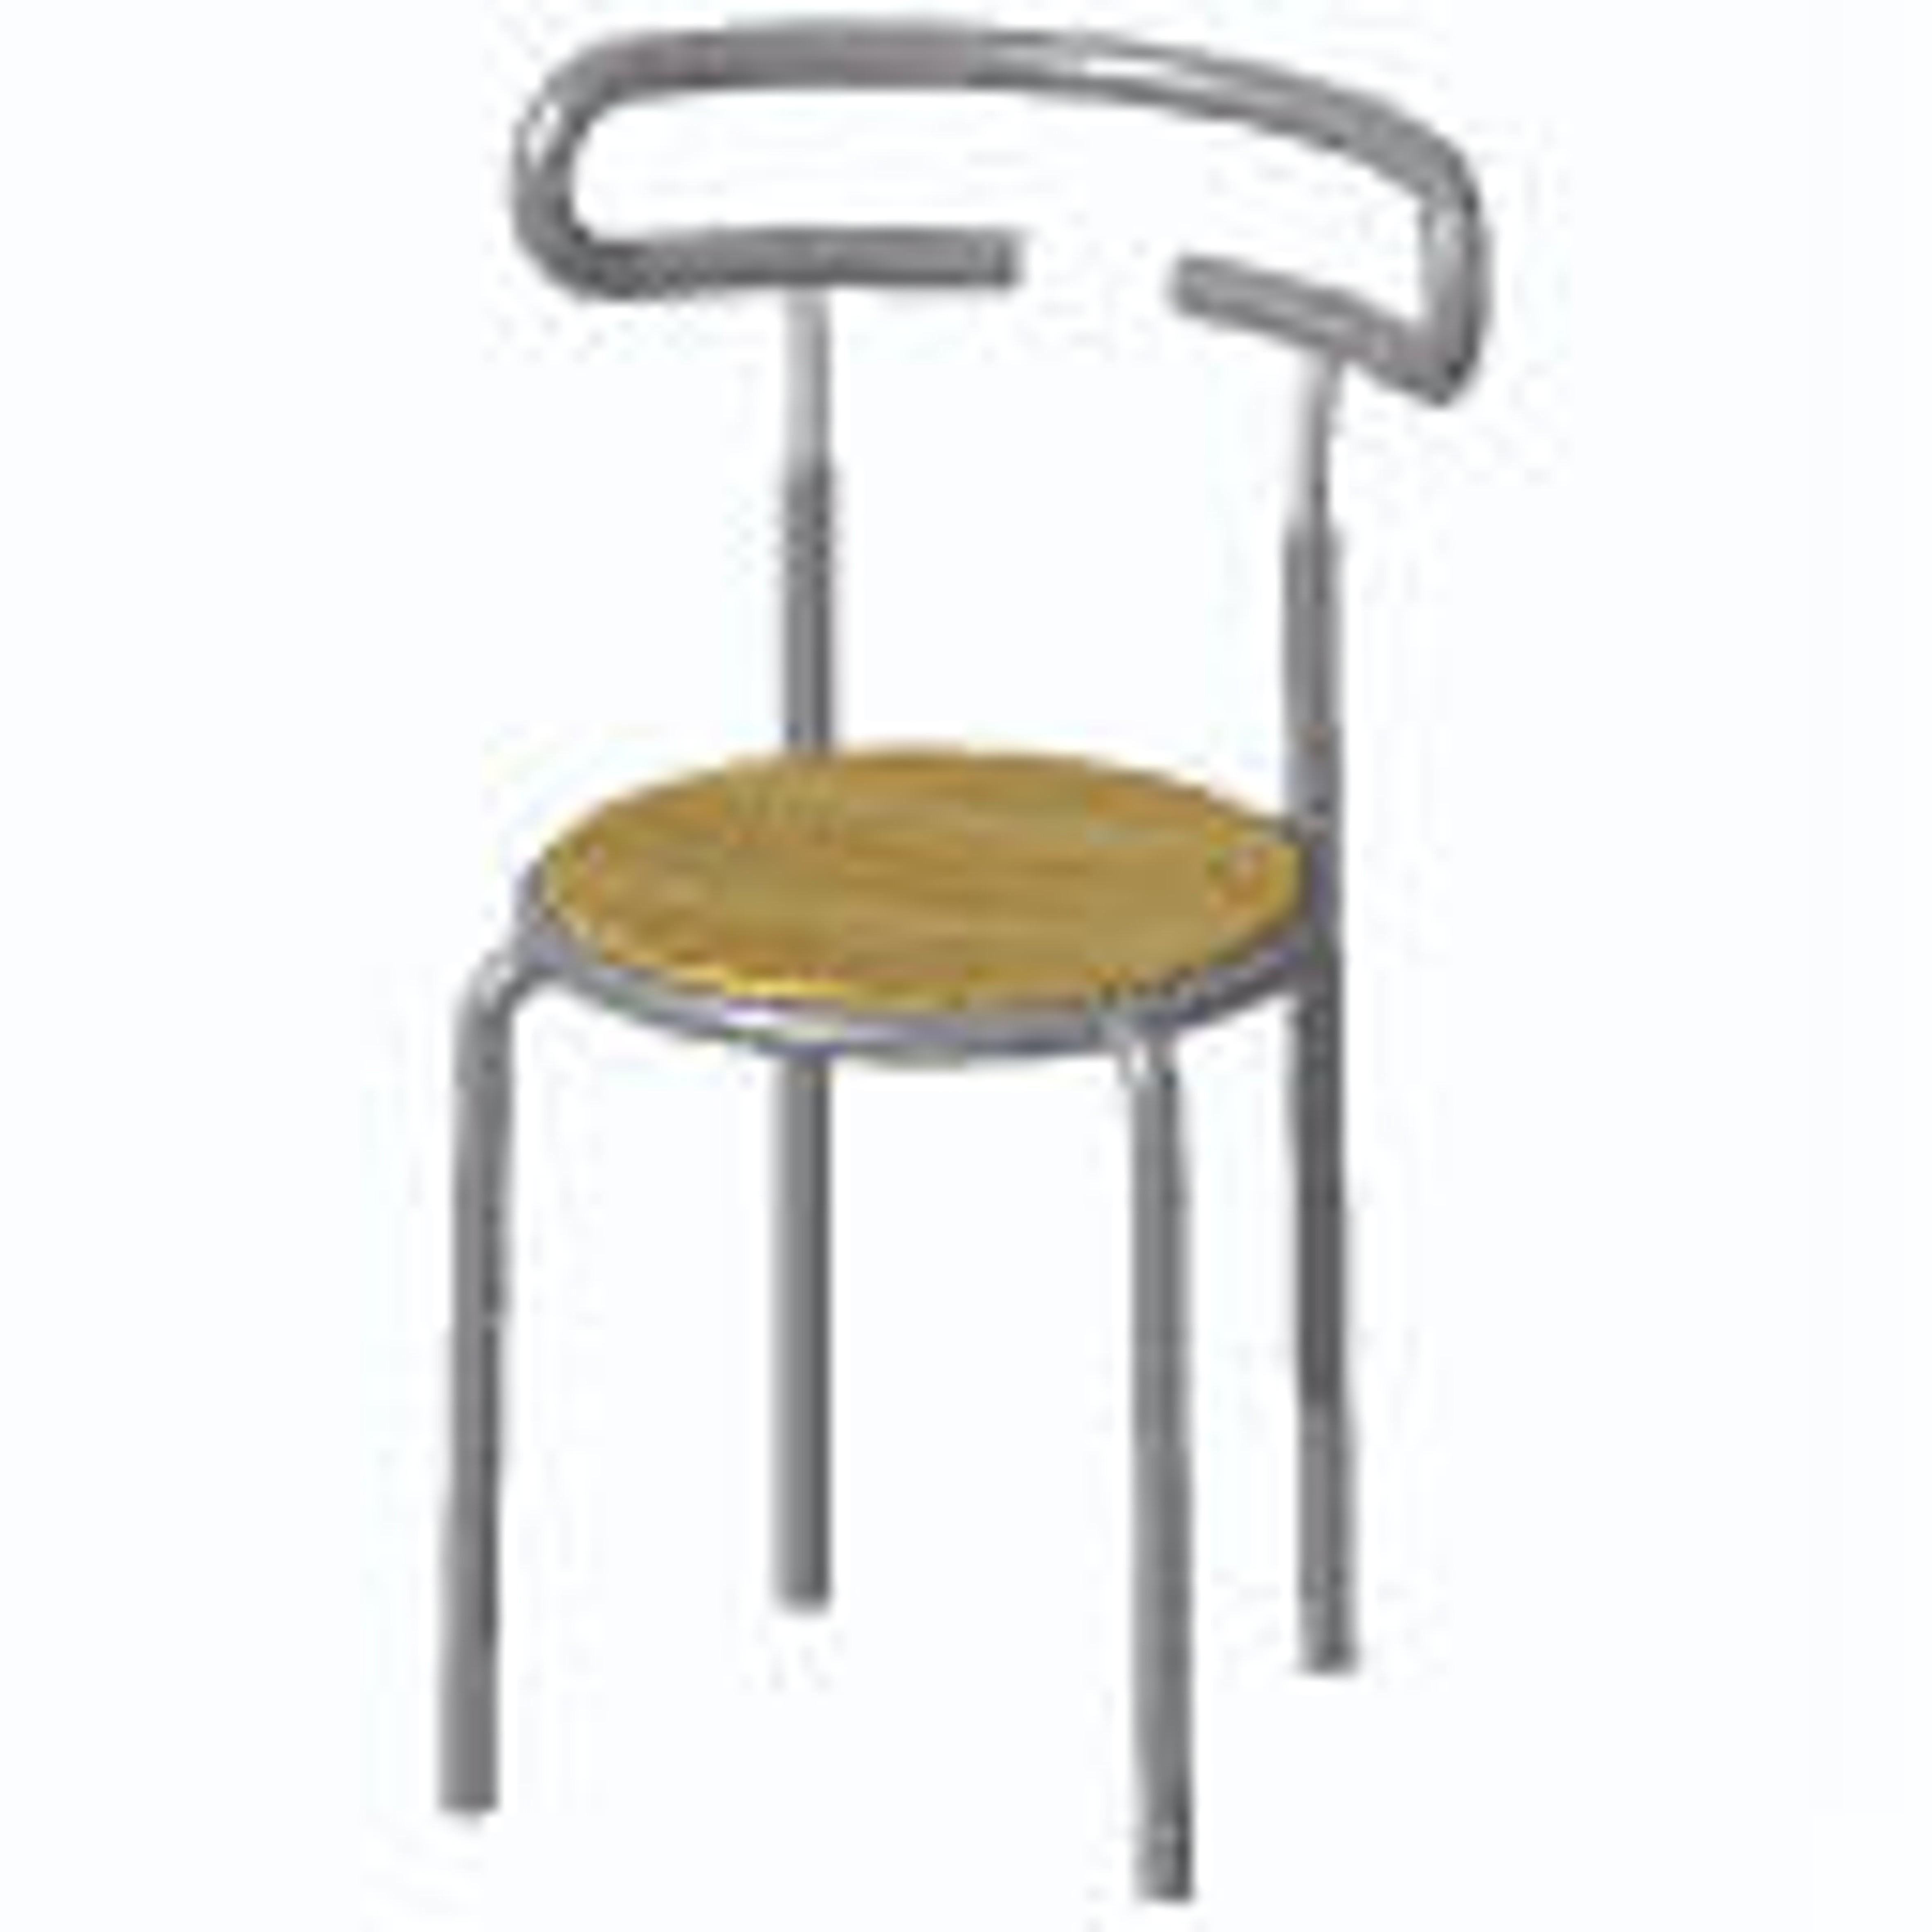 Design Chair 02 11.gsm 3D Model